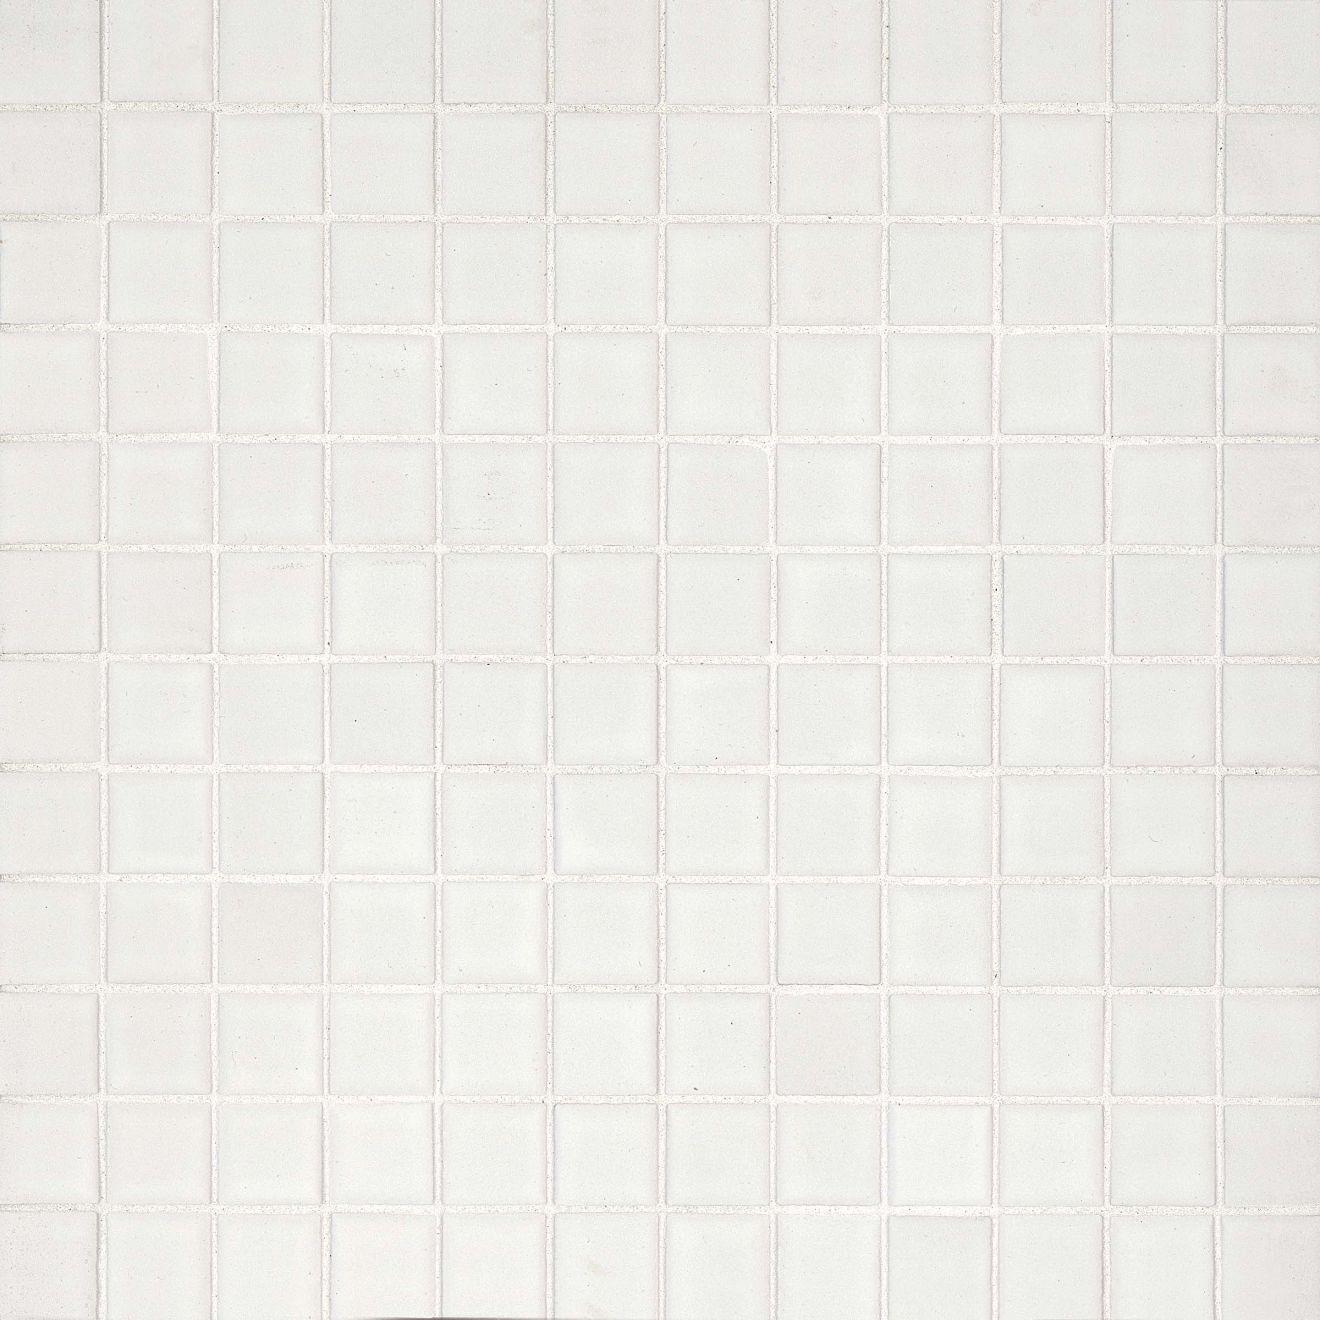 "True 1"" x 1"" Floor & Wall Mosaic in White"